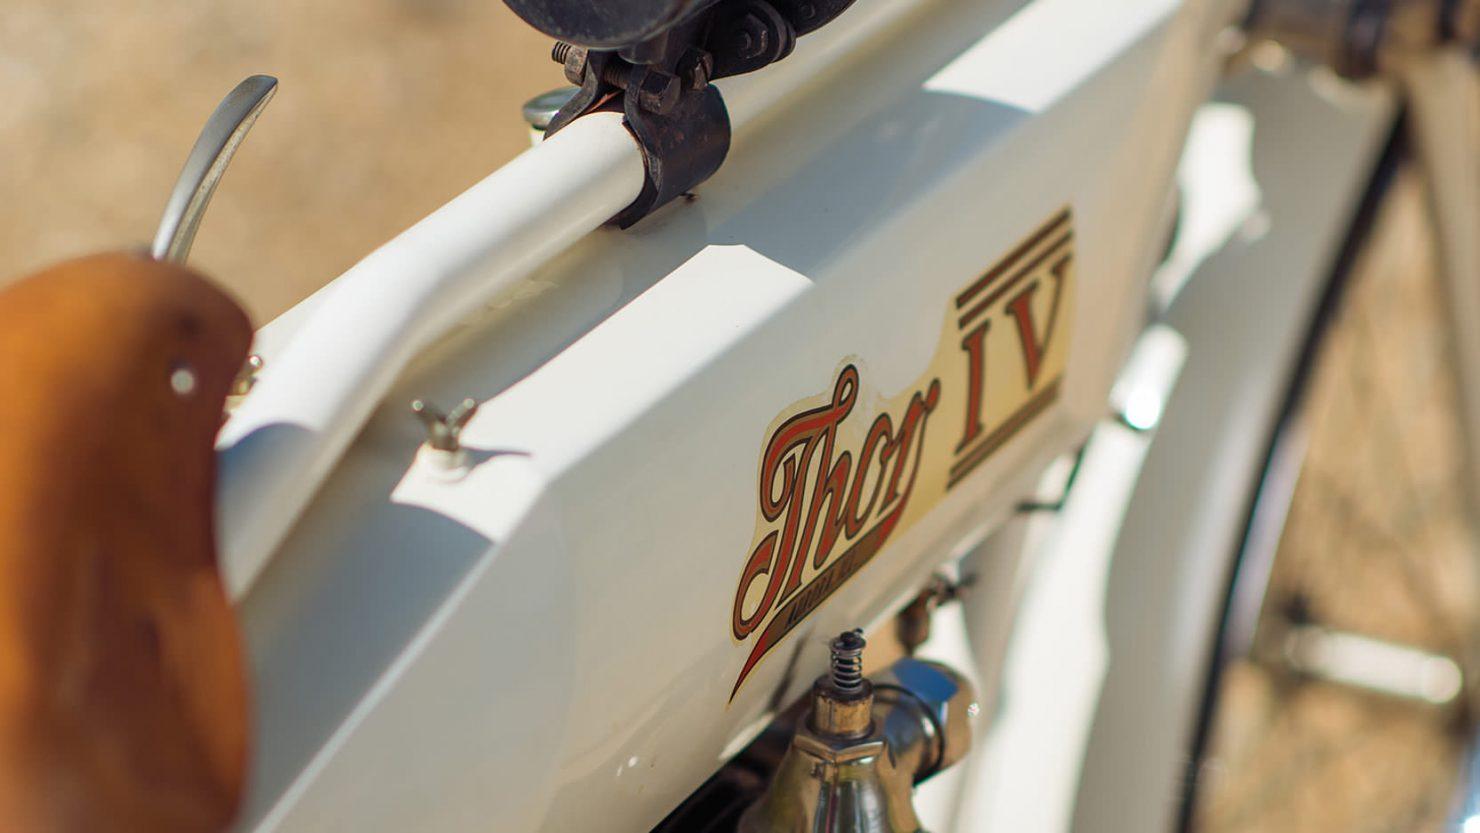 Thor Single Motorcycle 7 1480x833